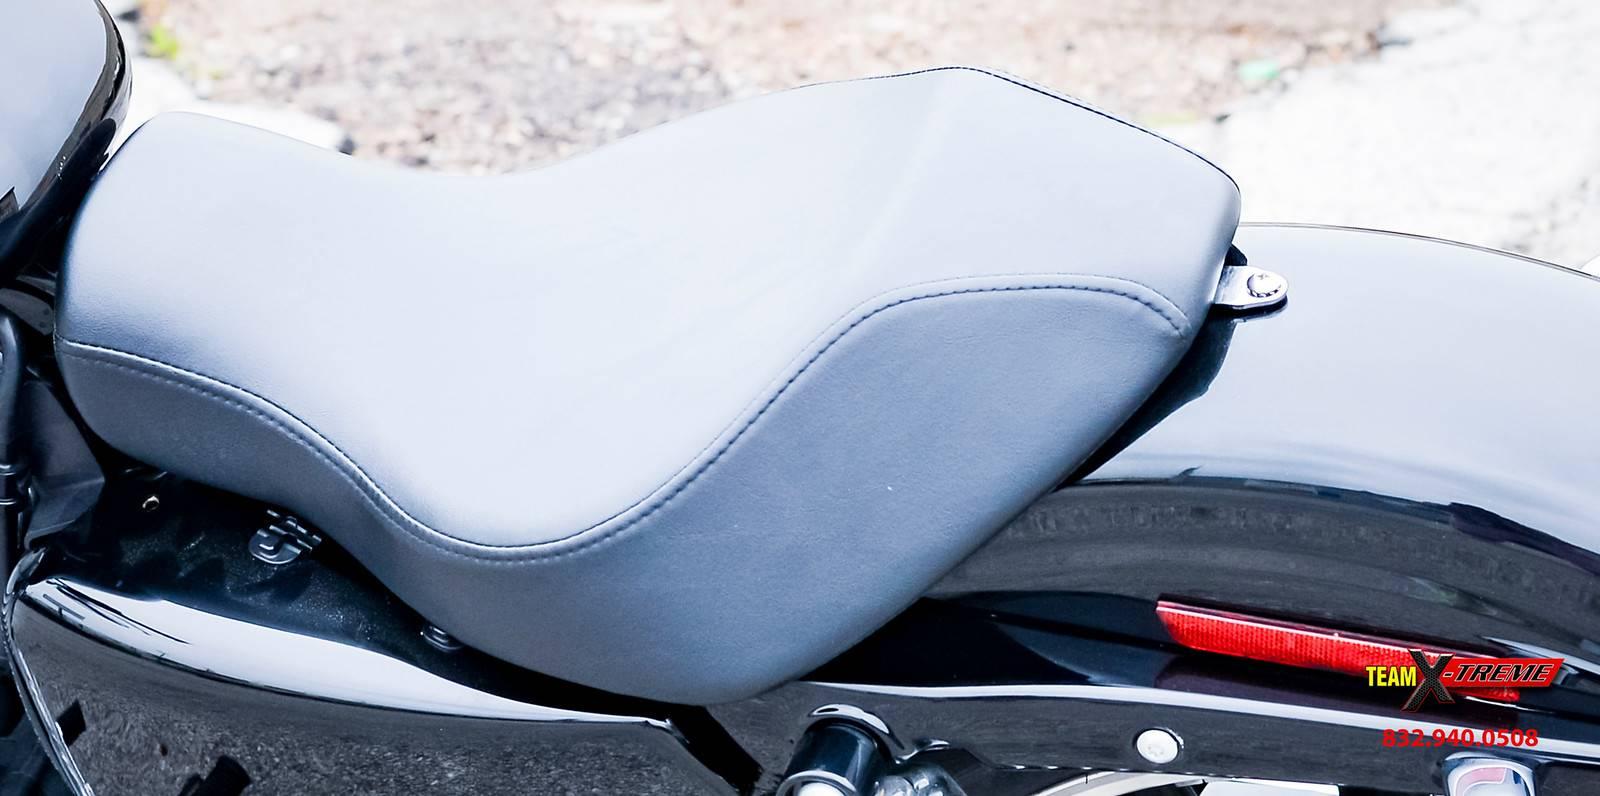 2014 Harley-Davidson Sportster SuperLow 10